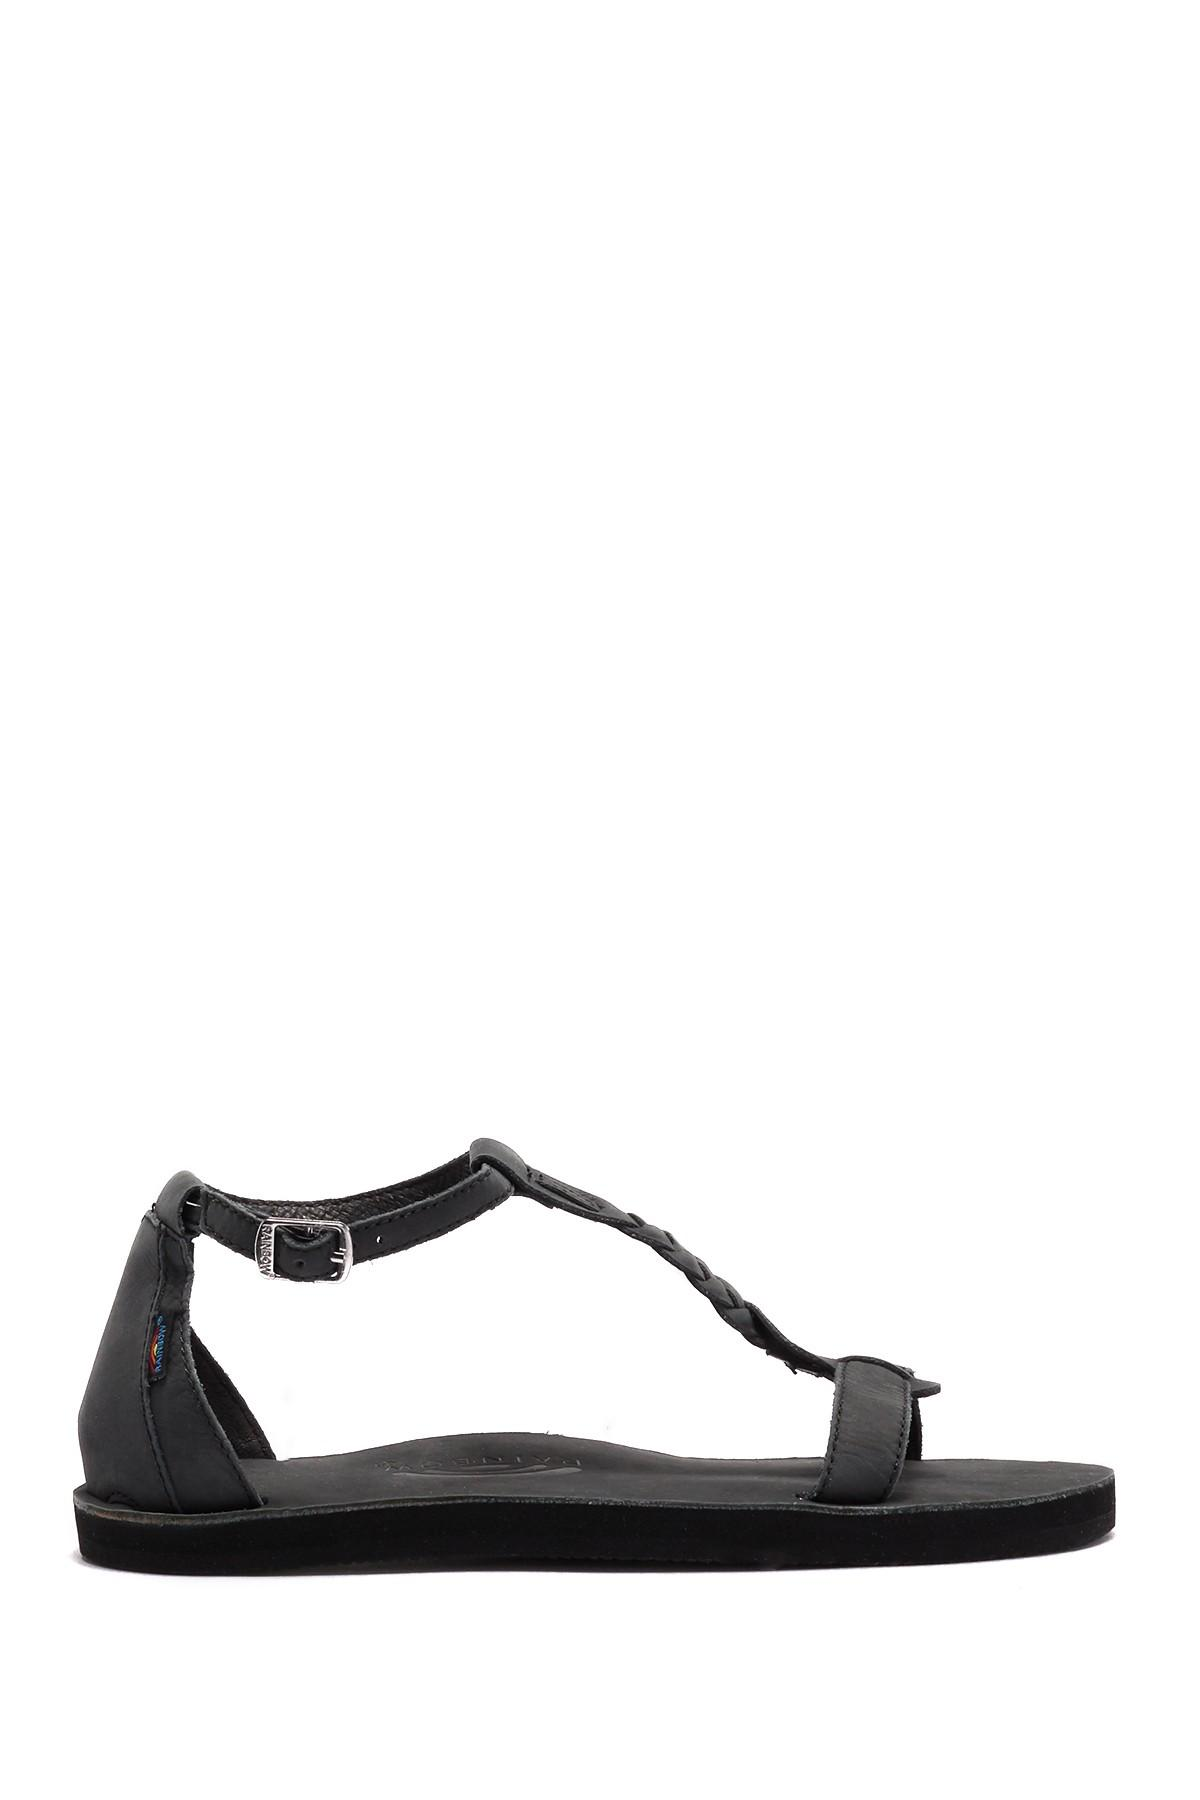 9c2fb32a11b Rainbow Sandals - Black Calafia Single Layer Center Braid Heel - Lyst. View  fullscreen